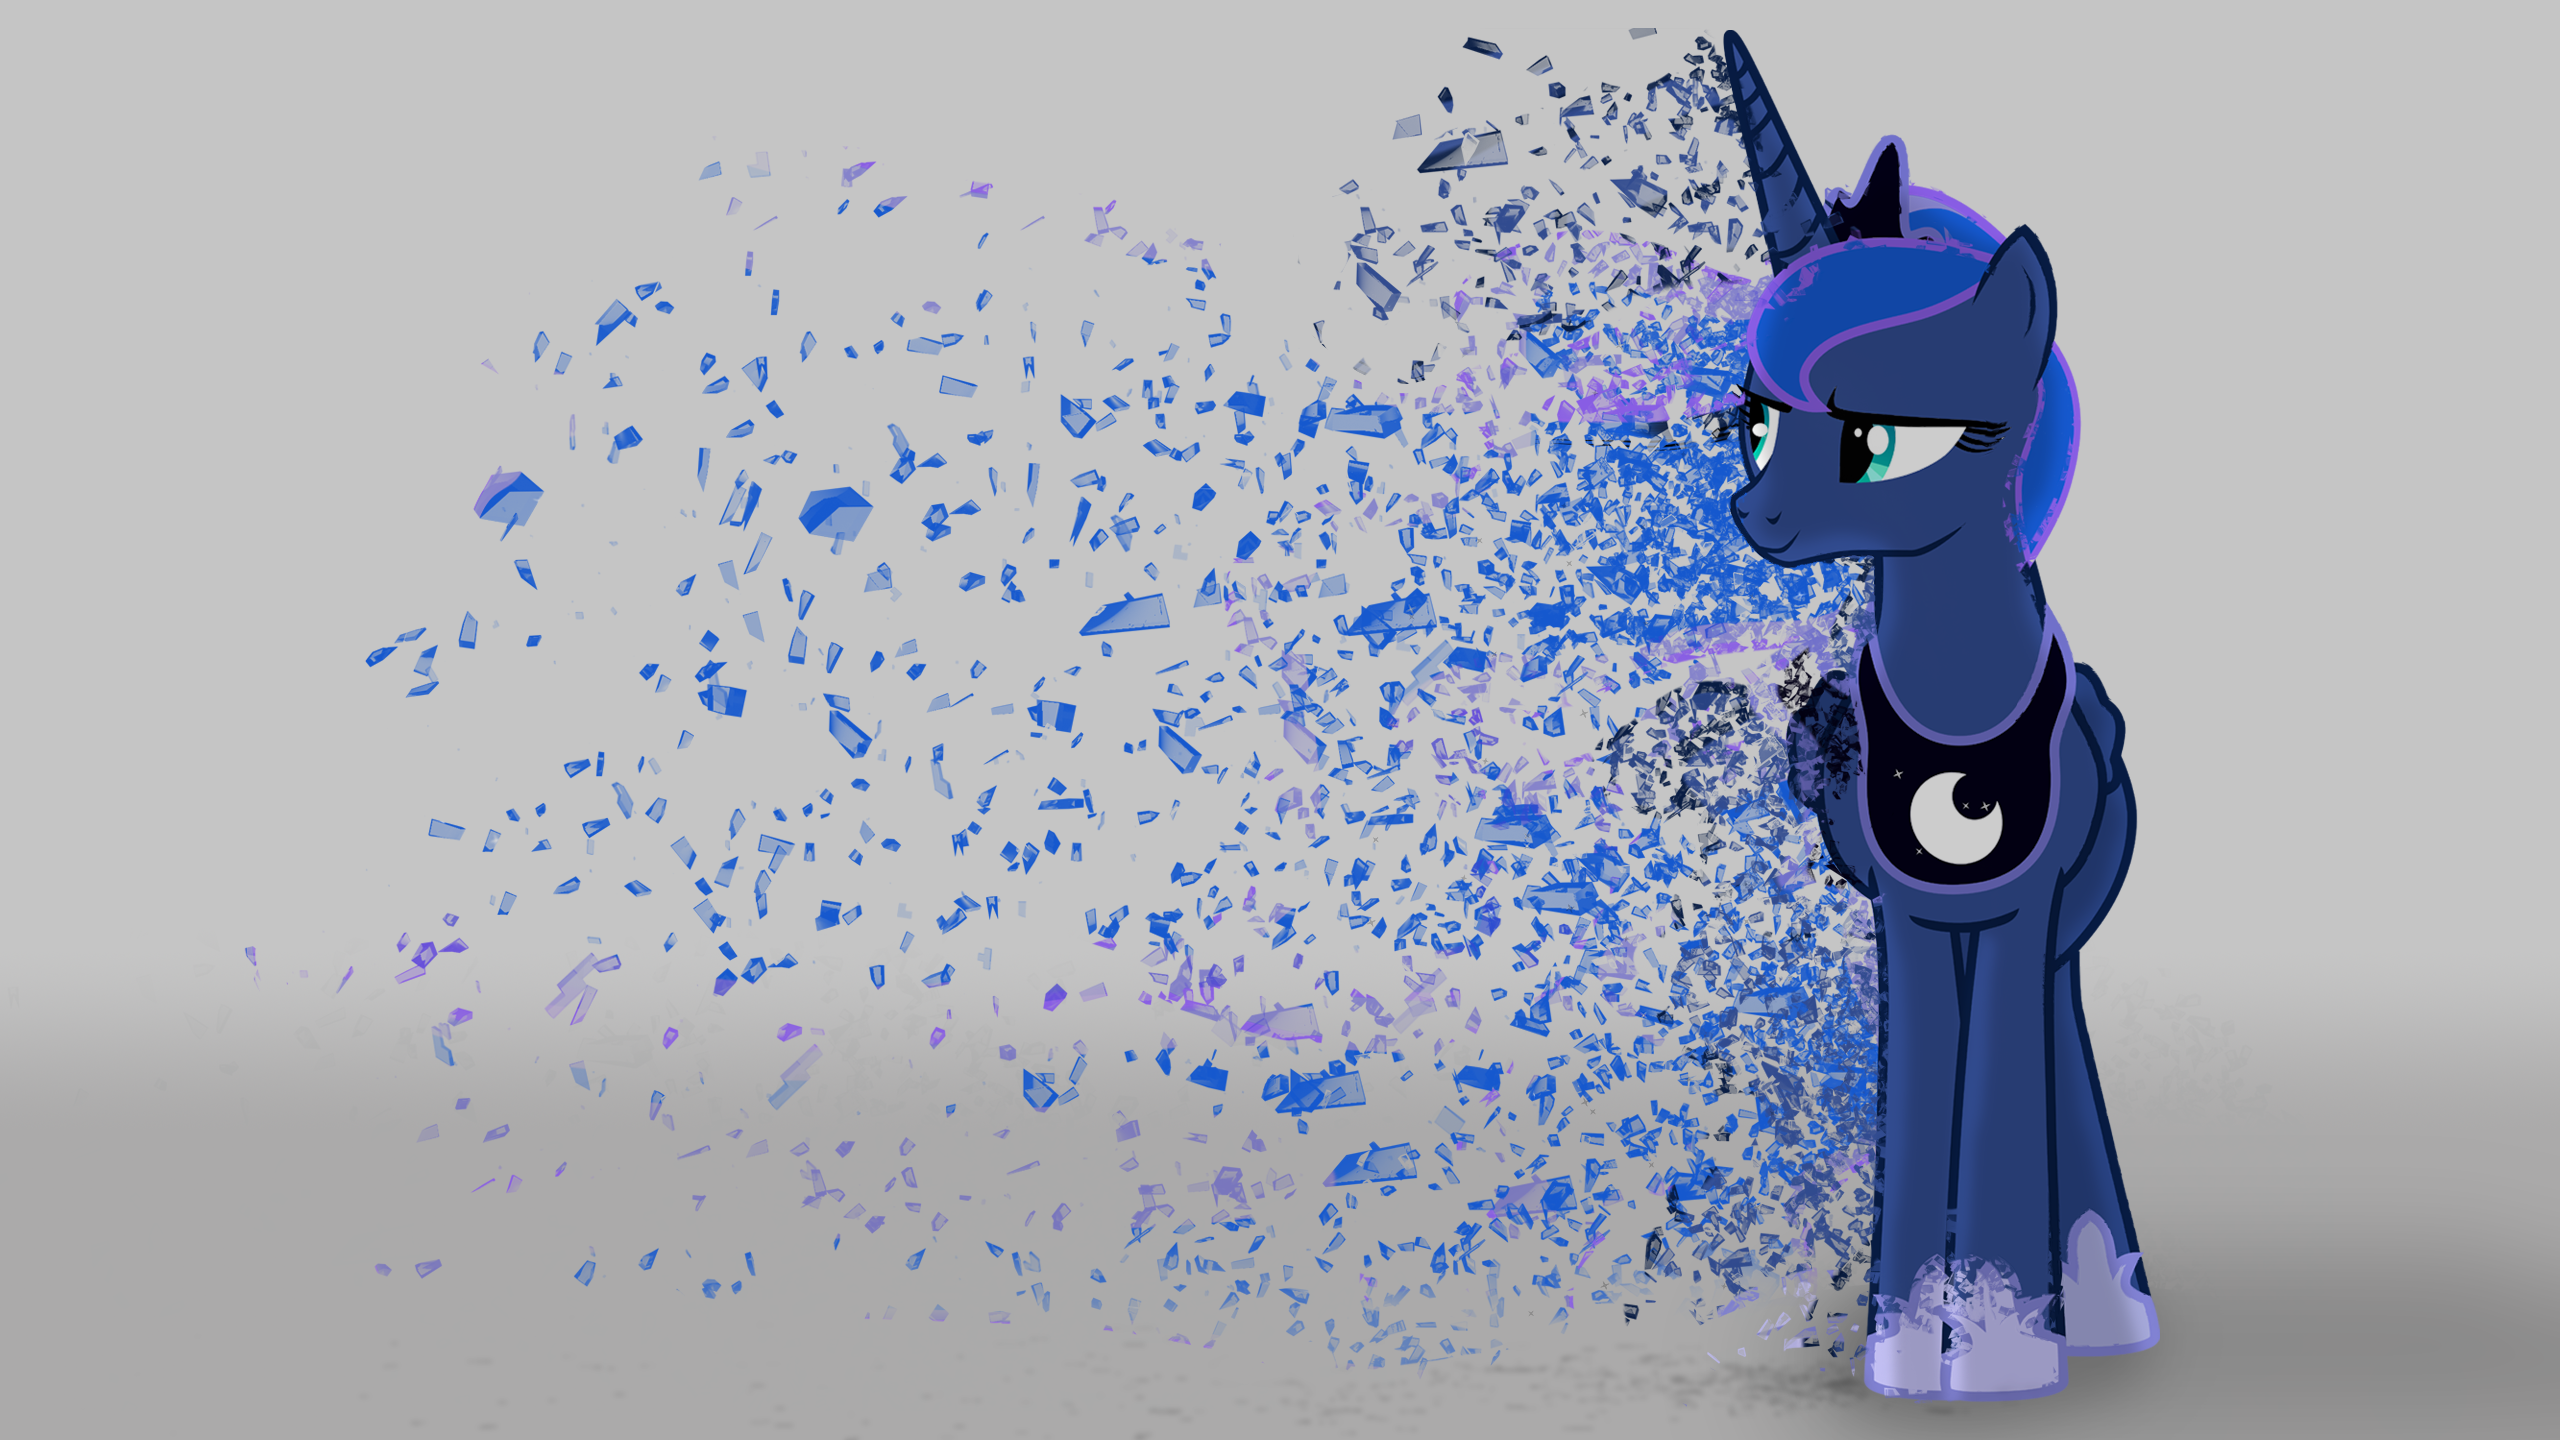 Free Download 1440p Images For Desktop My Little Pony Wallpaper